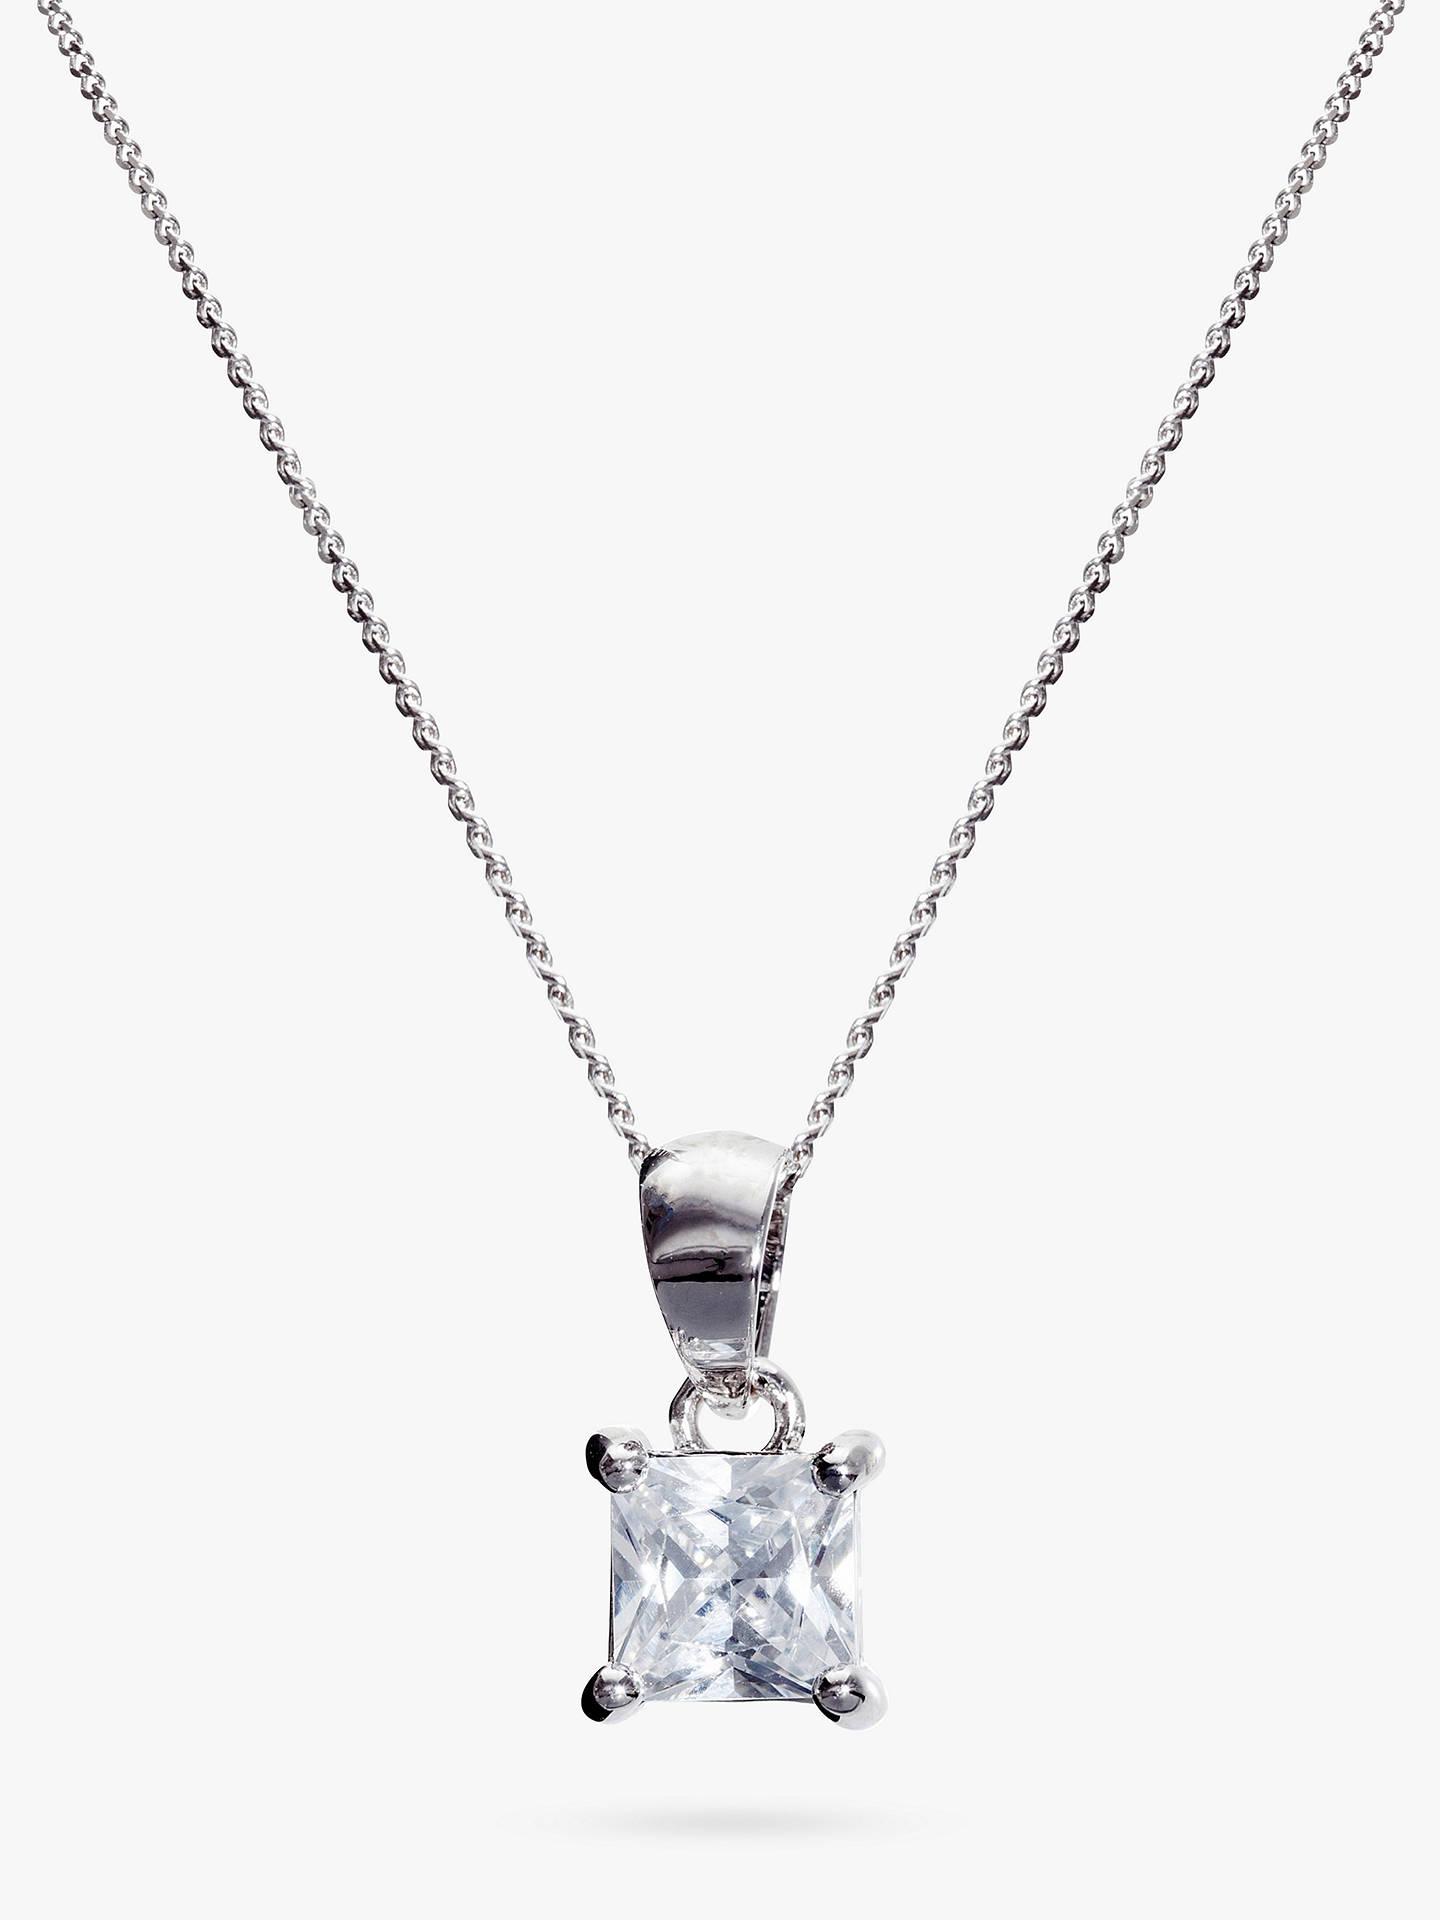 7d4be1ce41e6a Ivory & Co. Princess Solitaire Cubic Zirconia Pendant Necklace, Silver/Clear